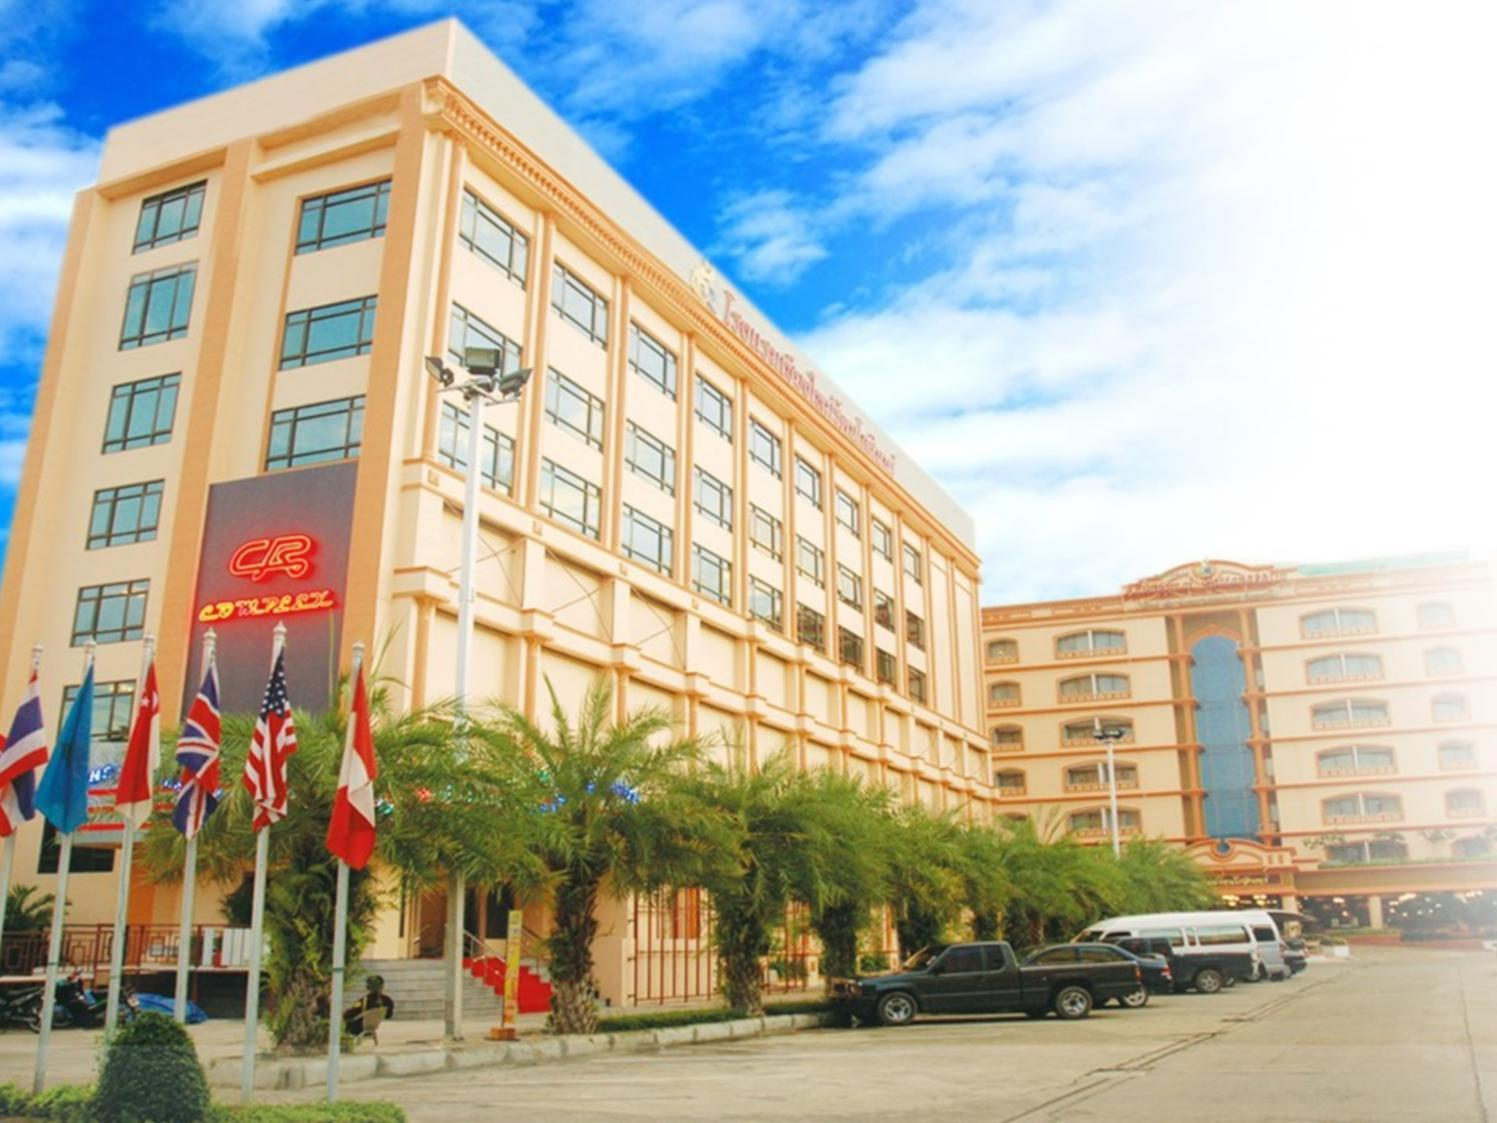 Chiangmai Ratanakosin Hotel - Hotels and Accommodation in Thailand, Asia